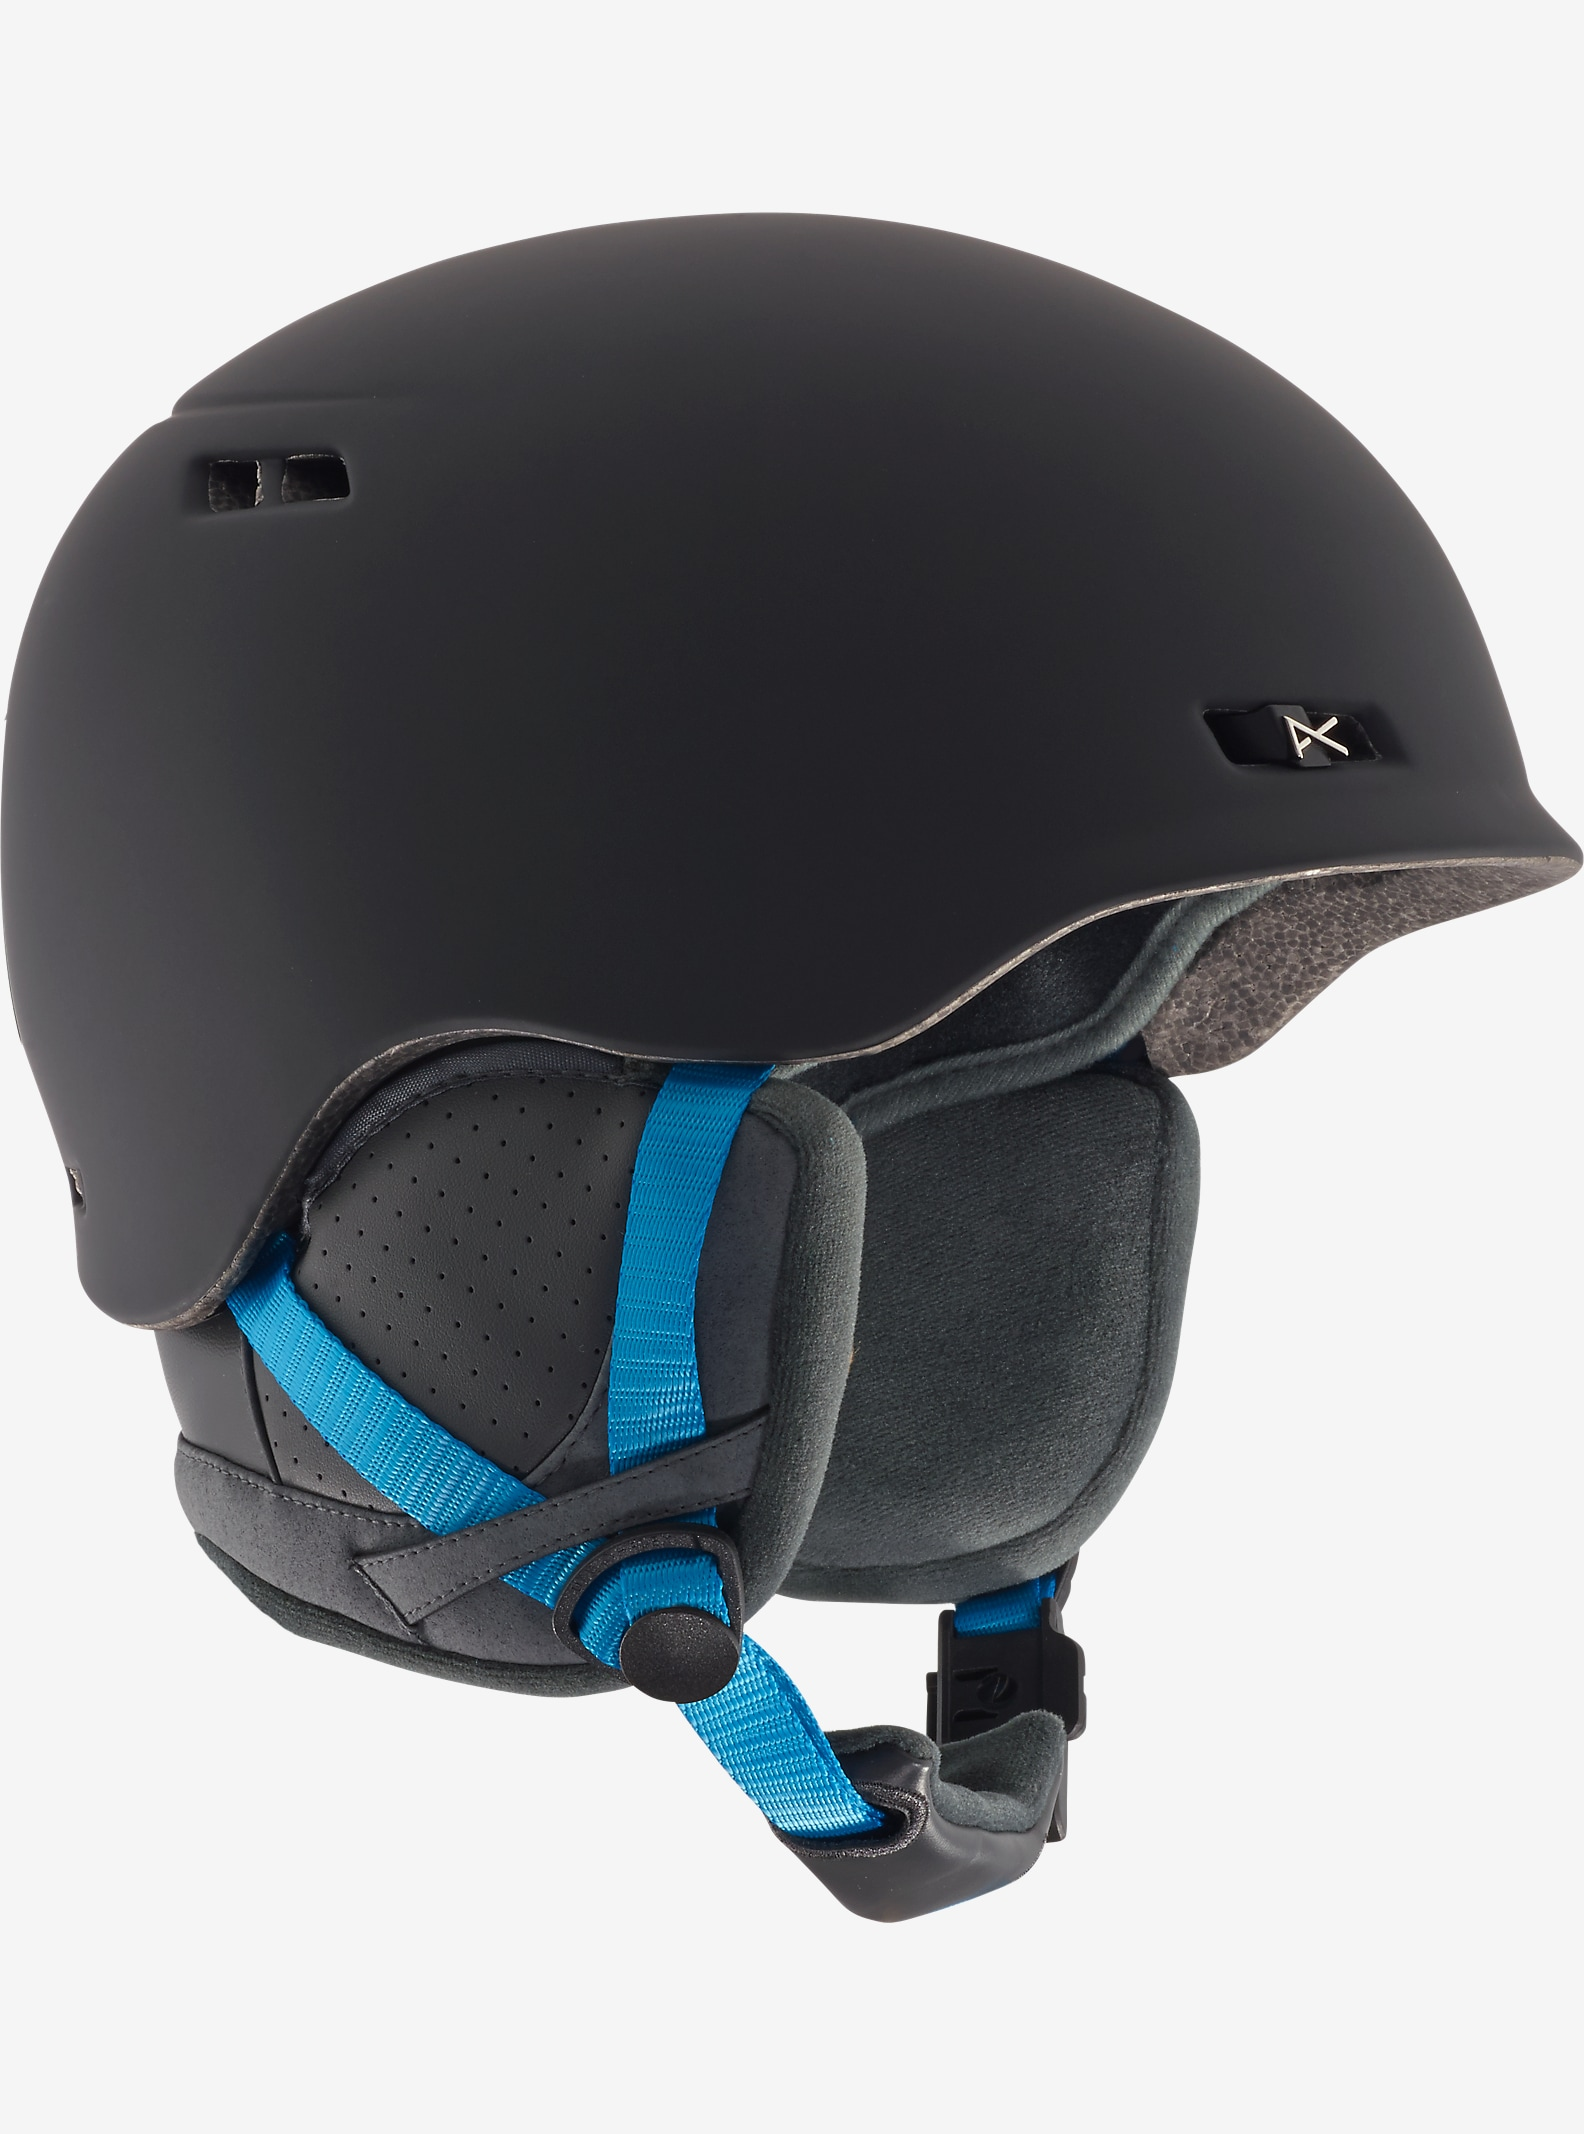 anon. Rodan Helmet shown in Black / Blue